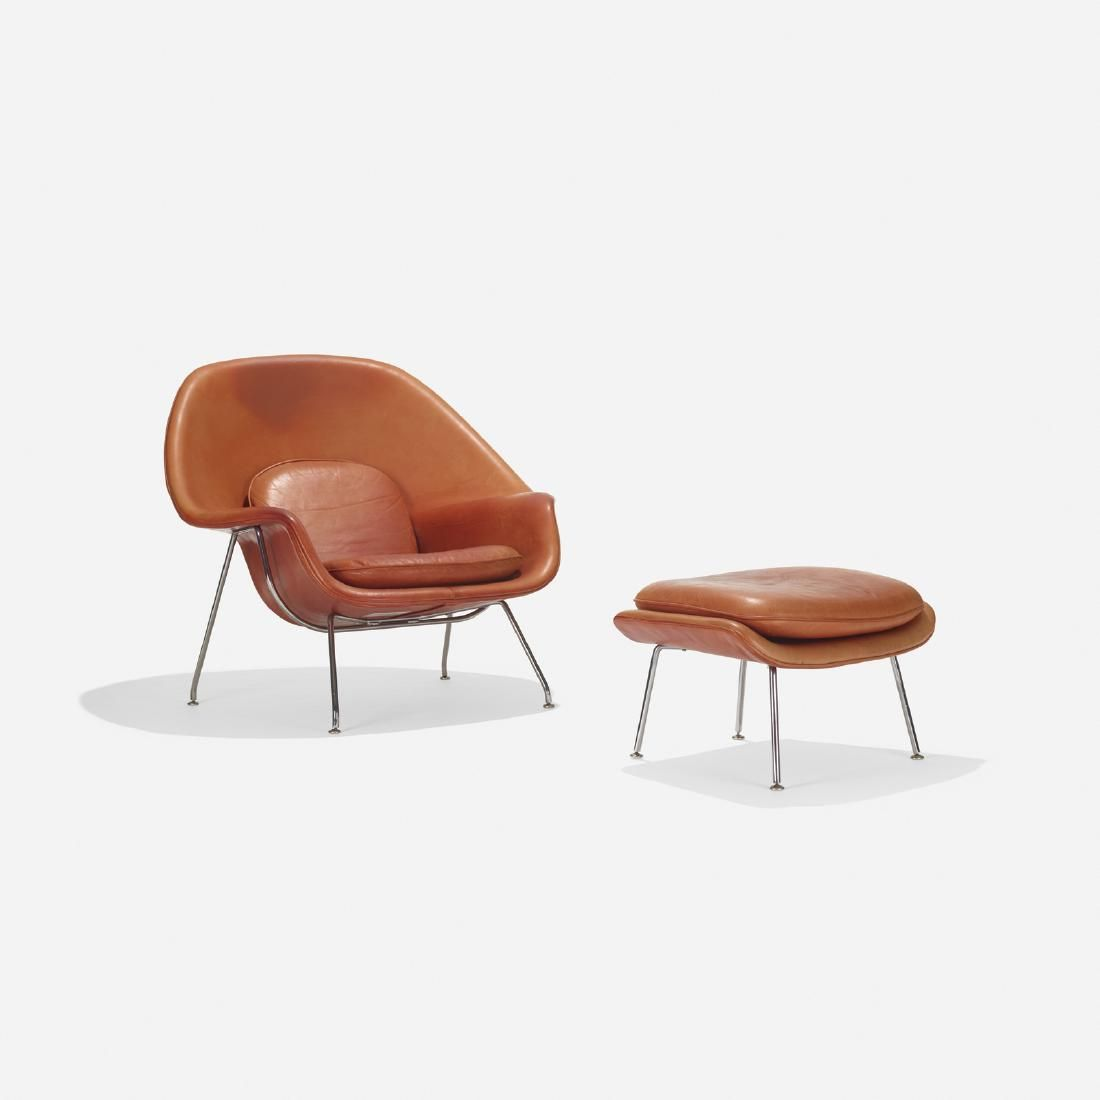 Eero Saarinen, Rare Womb chair and ottoman